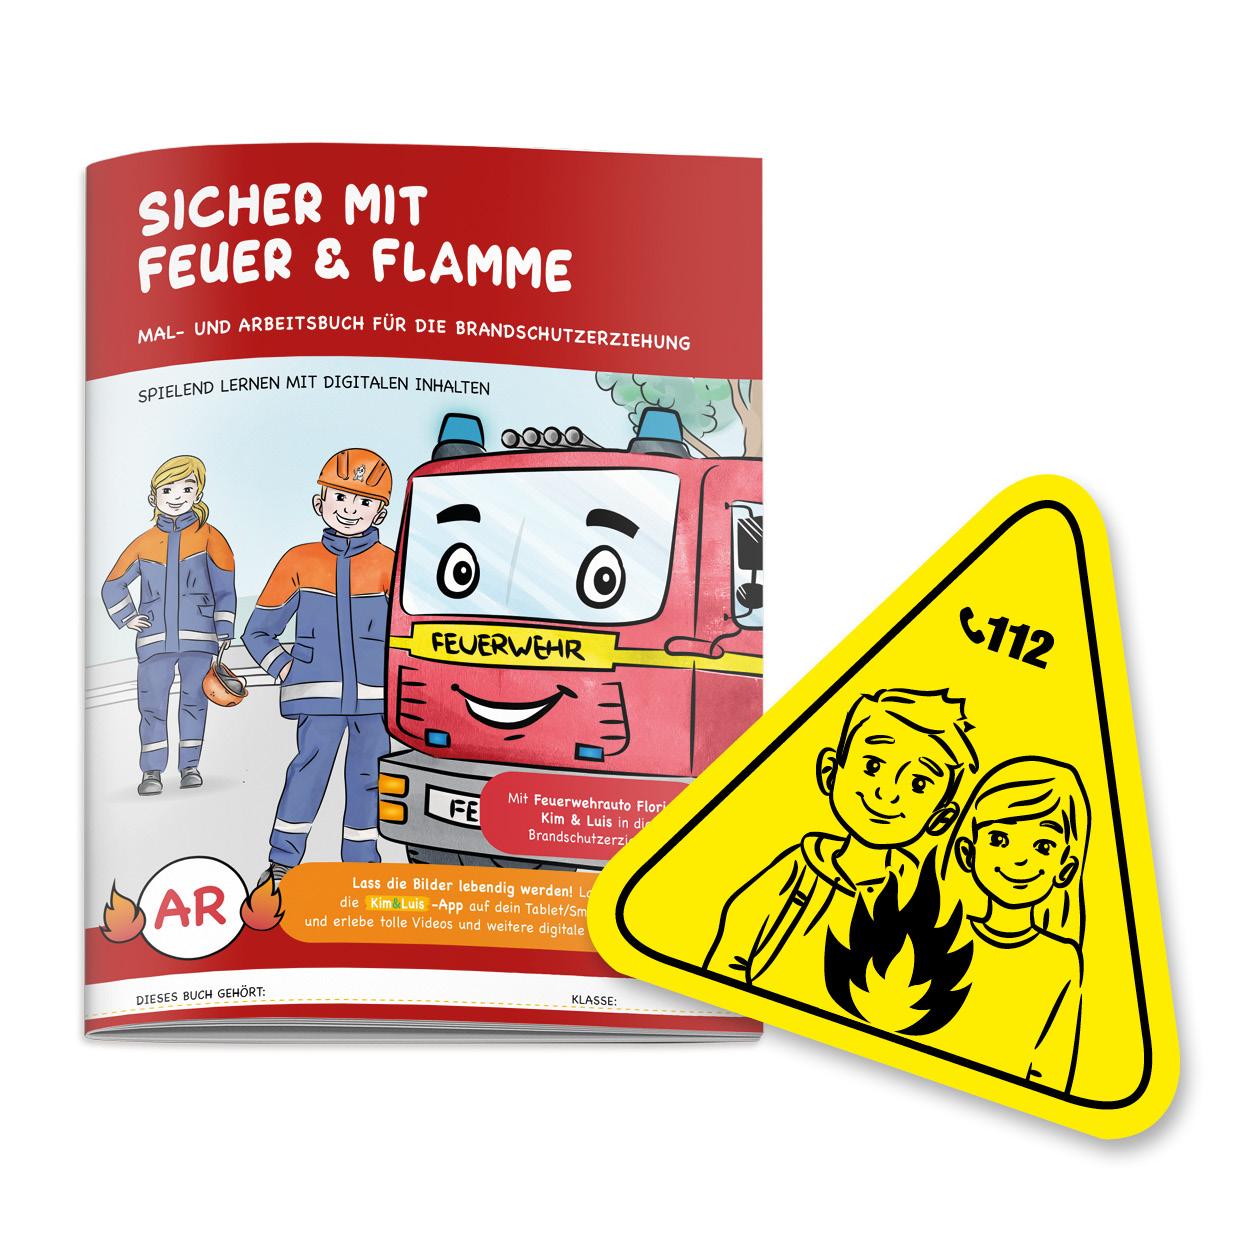 Brandschutzbuch_150dpi.jpg